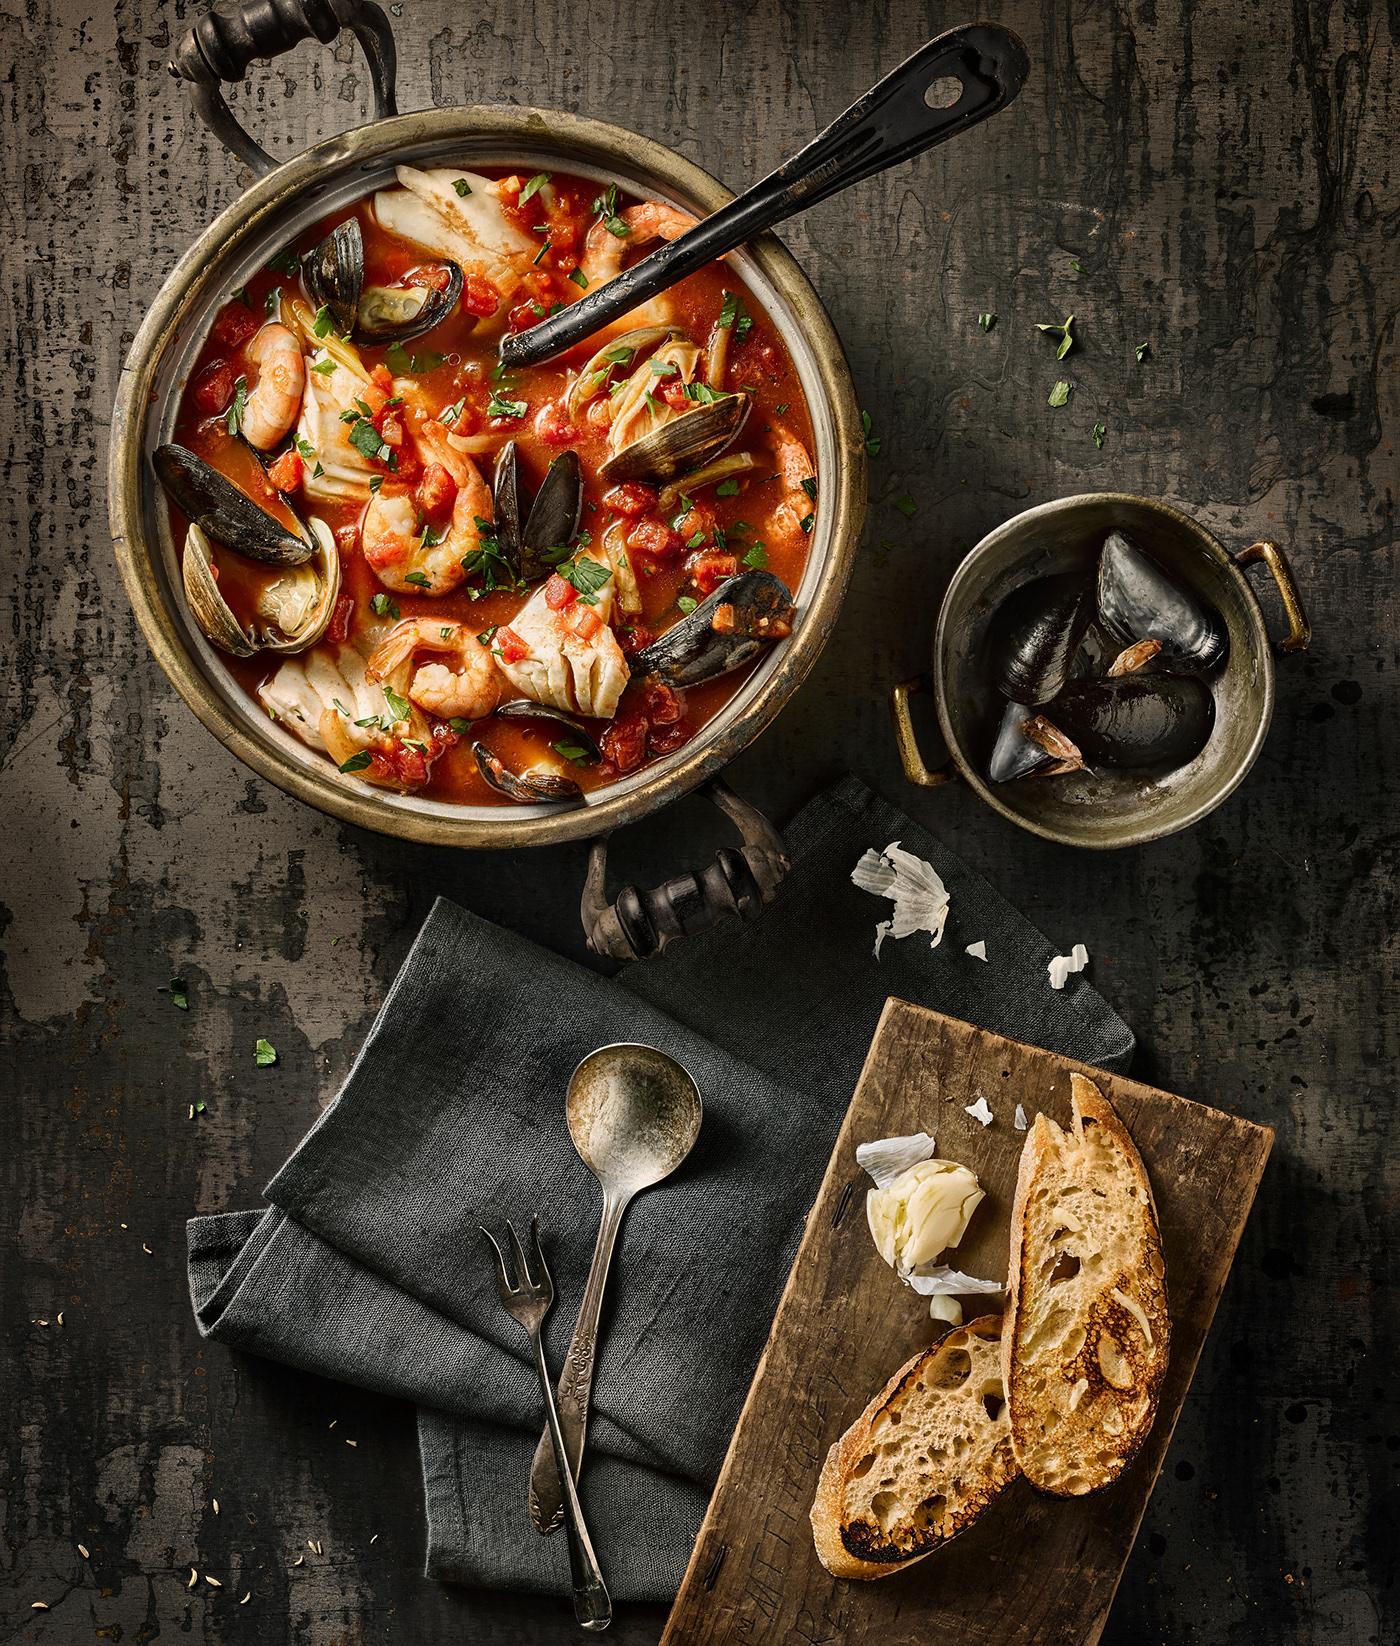 Egg & Potato. Fish & Fowl. Four Seasons of Exploration / фото Greg Stroube